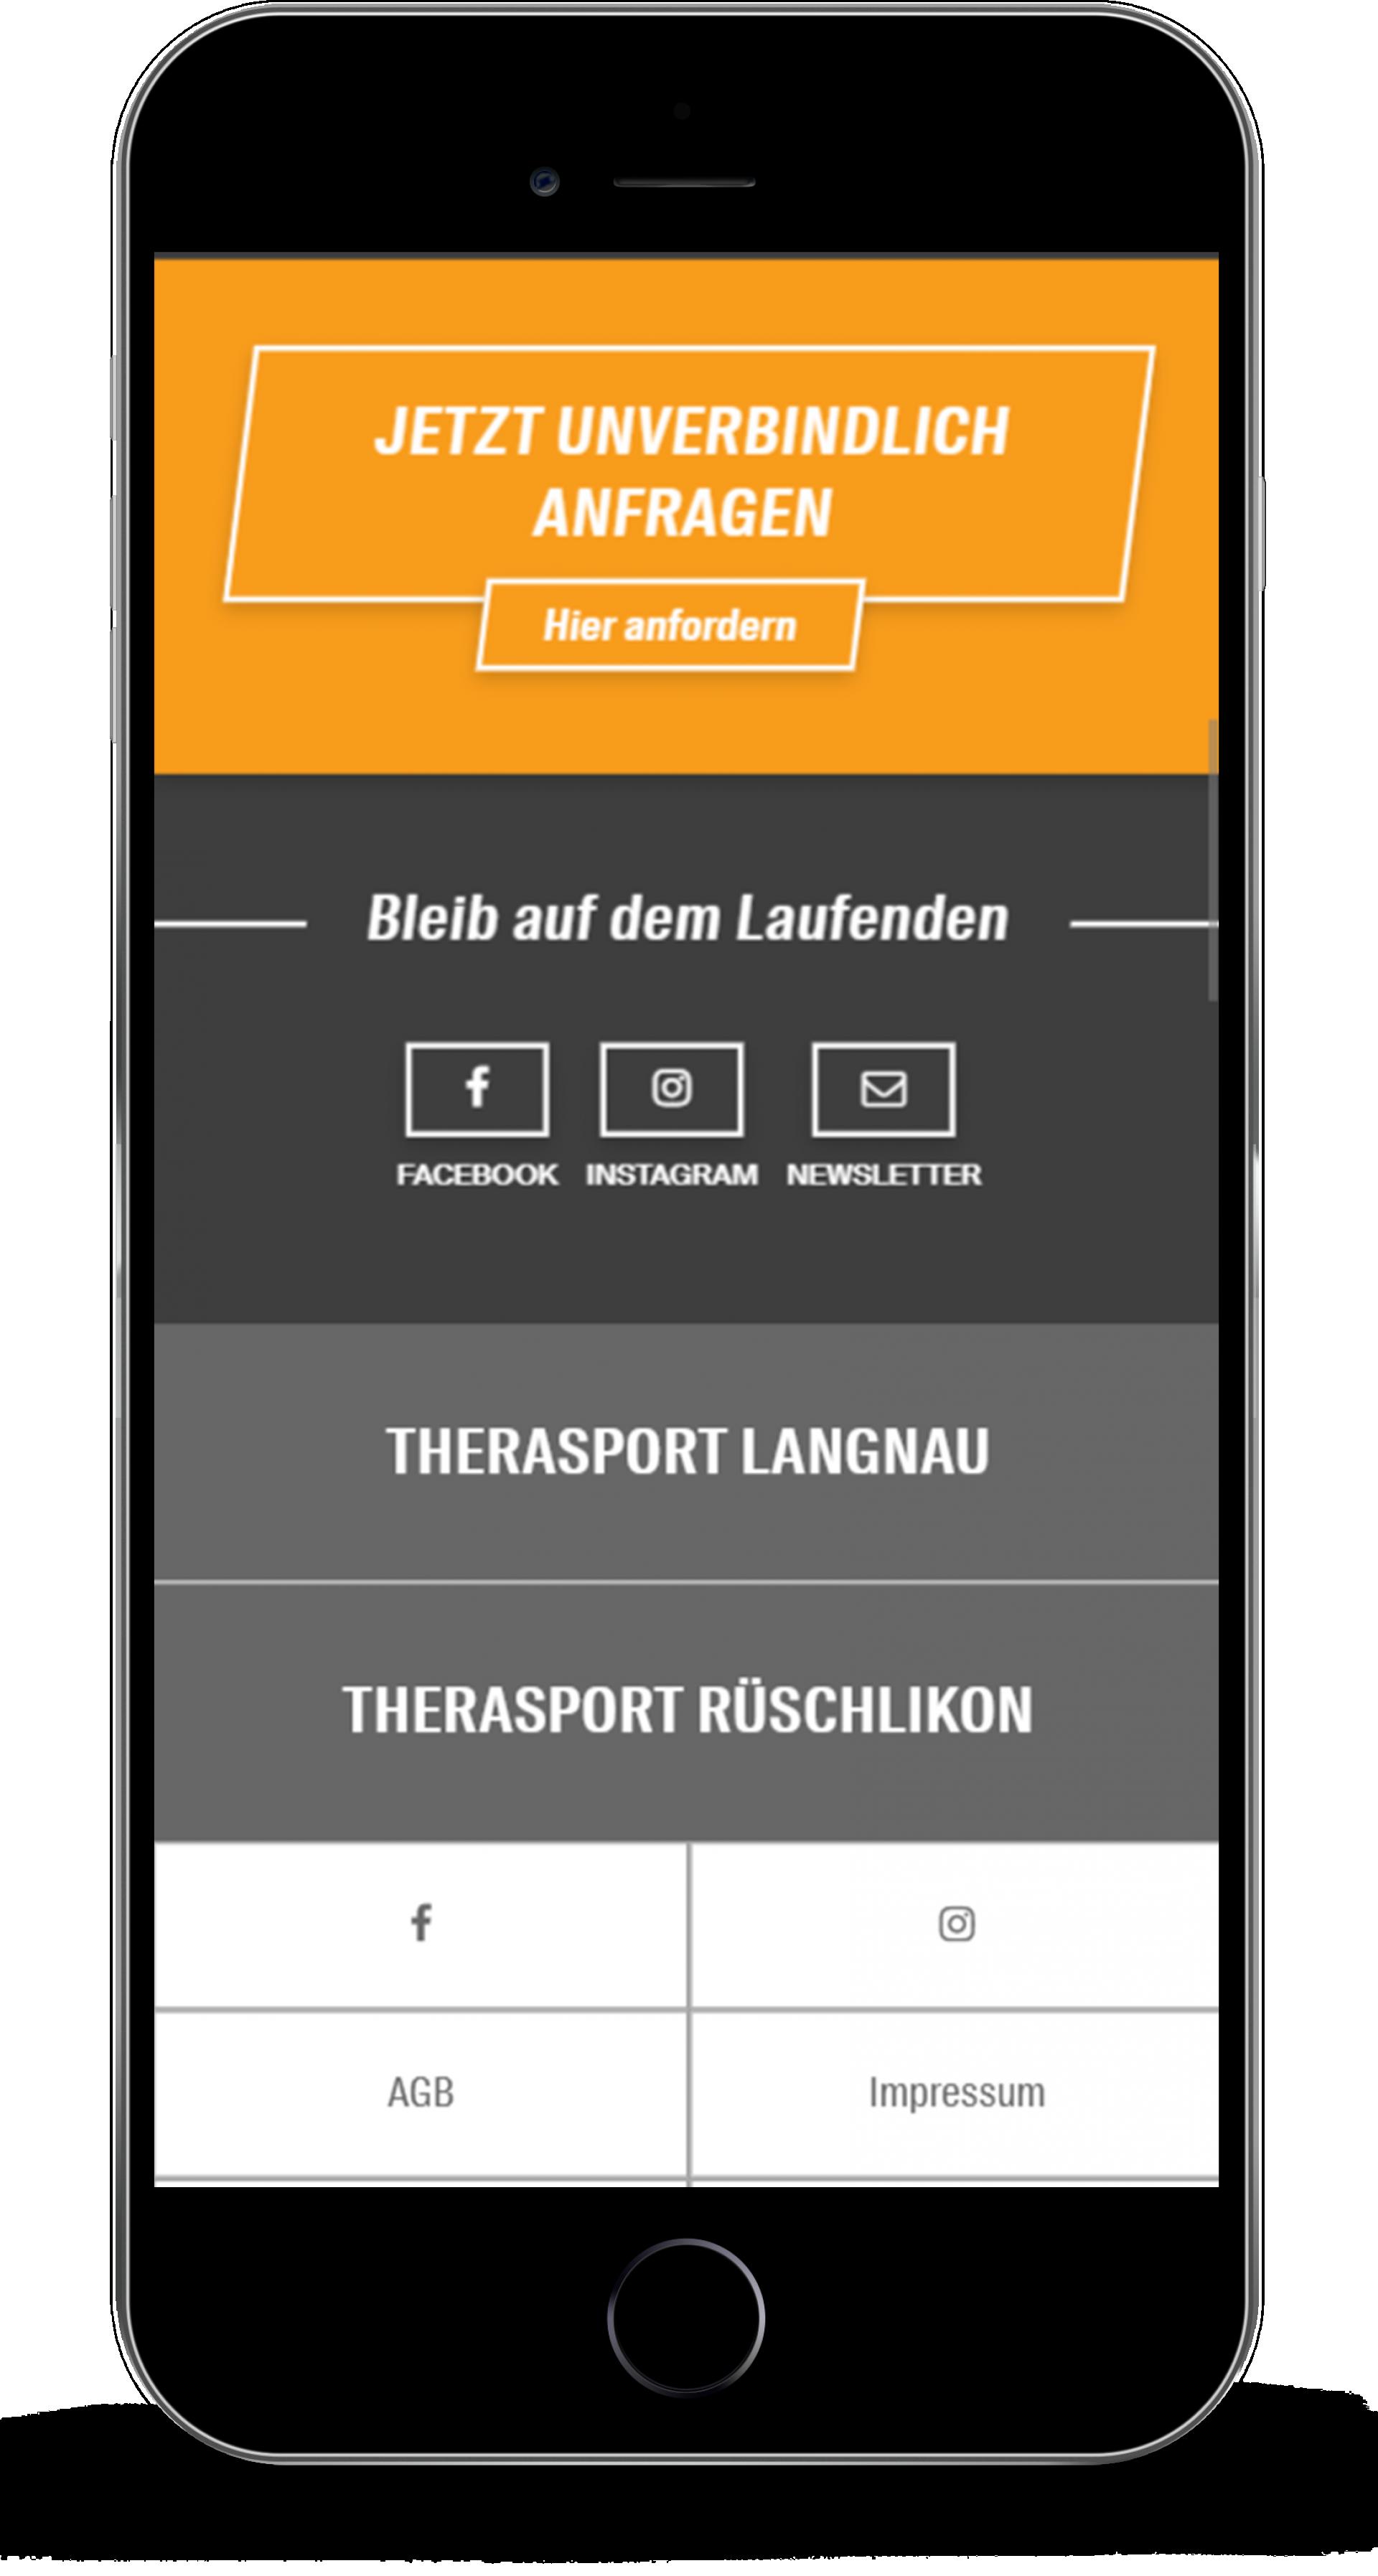 Therasport Mobile Design Footer